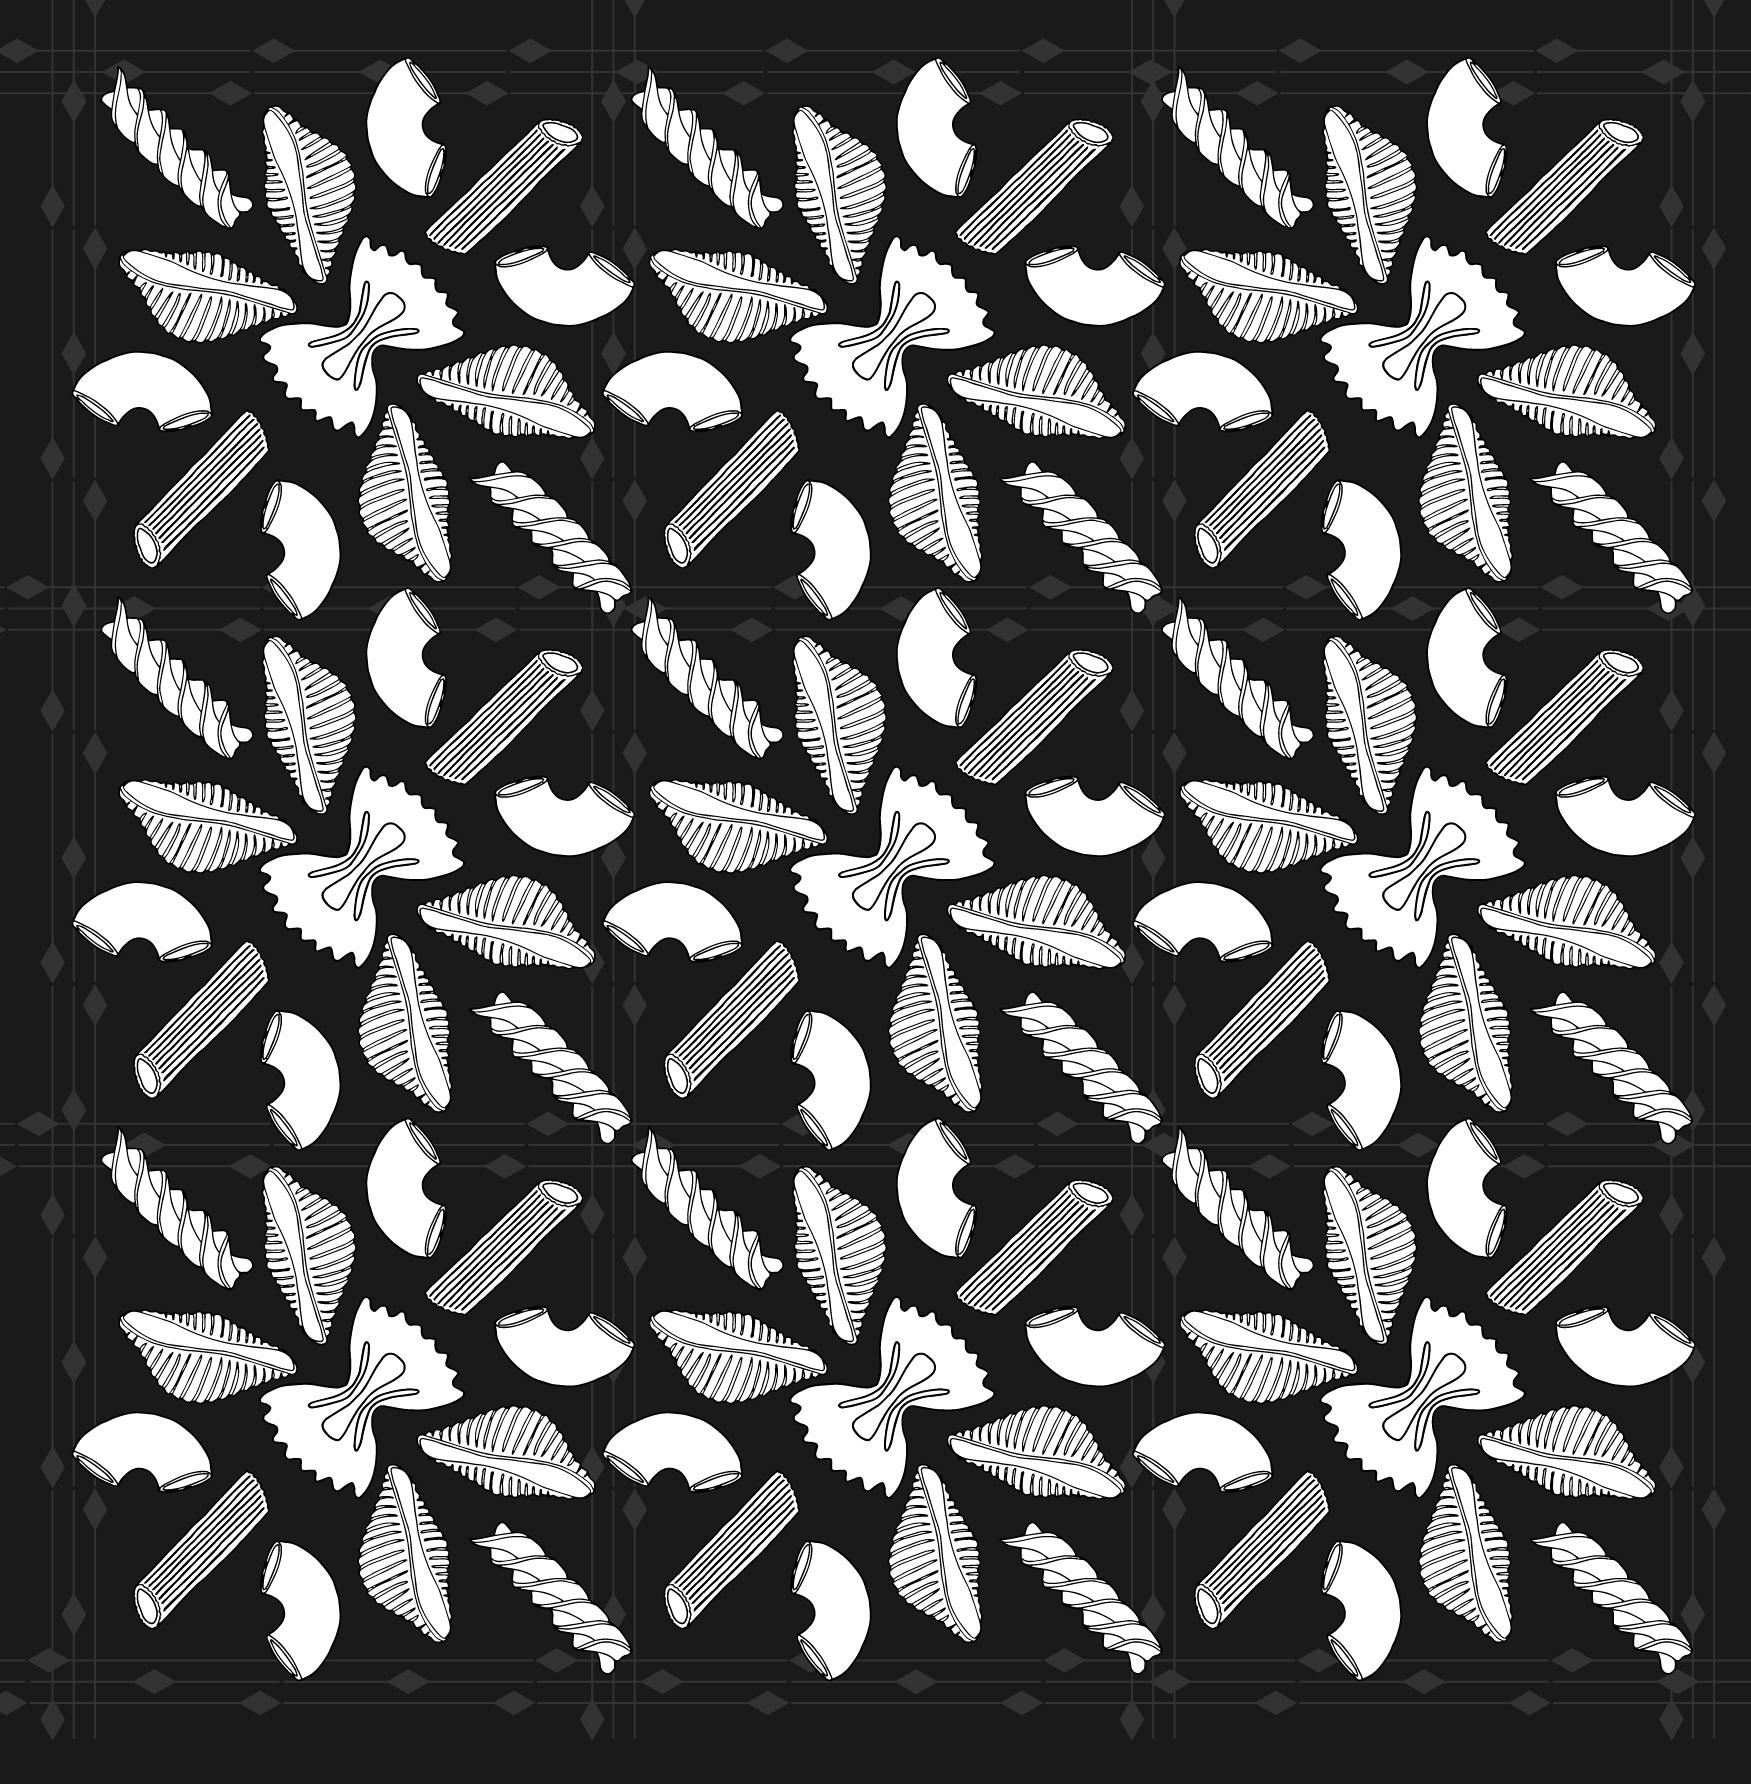 pasta-pattern-05.jpg